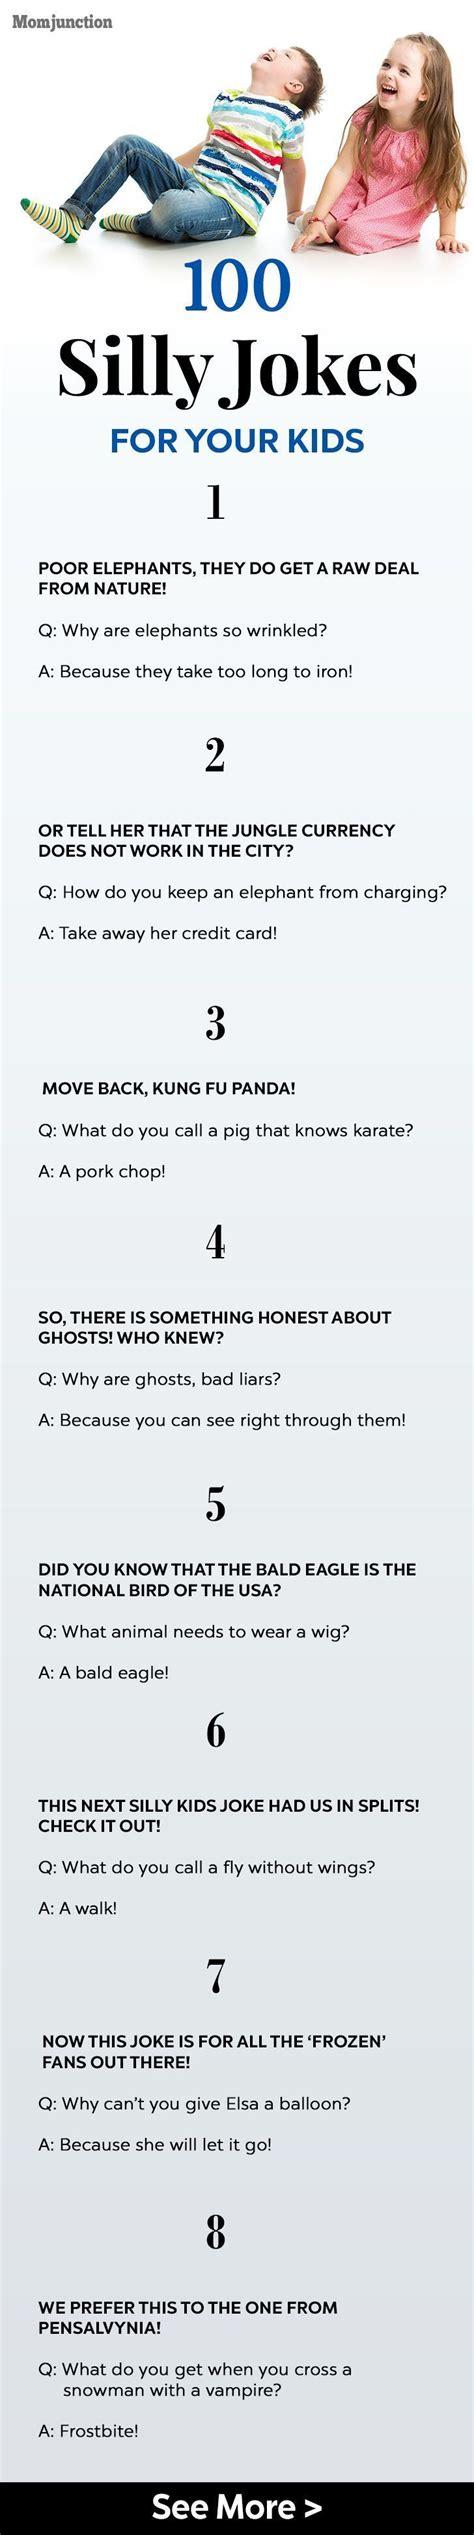 printable clean jokes for adults 18 best jokes for kids images on pinterest baby humor